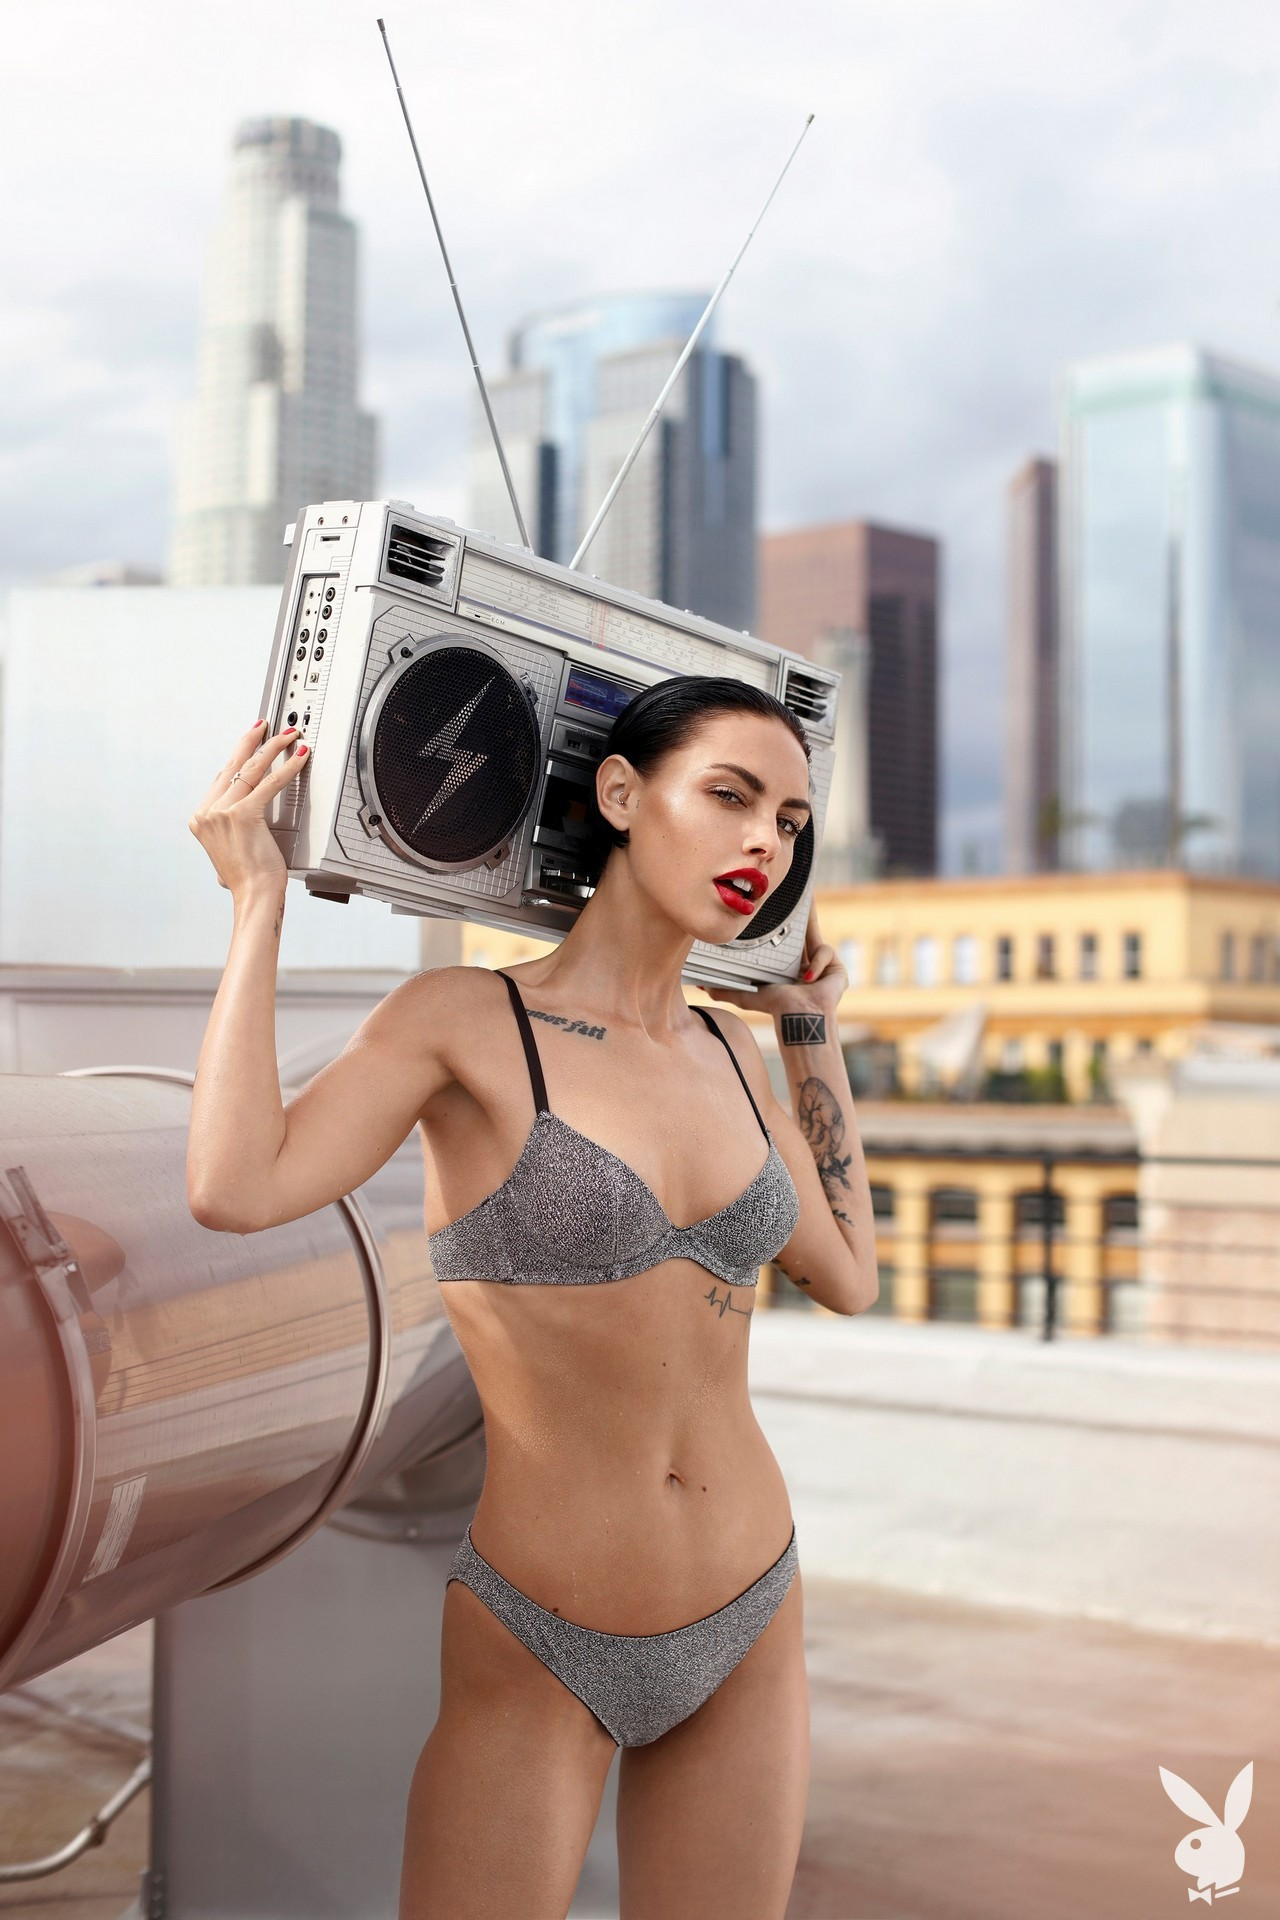 Playmate July 2019 Teela Laroux Playboy Plus (10)